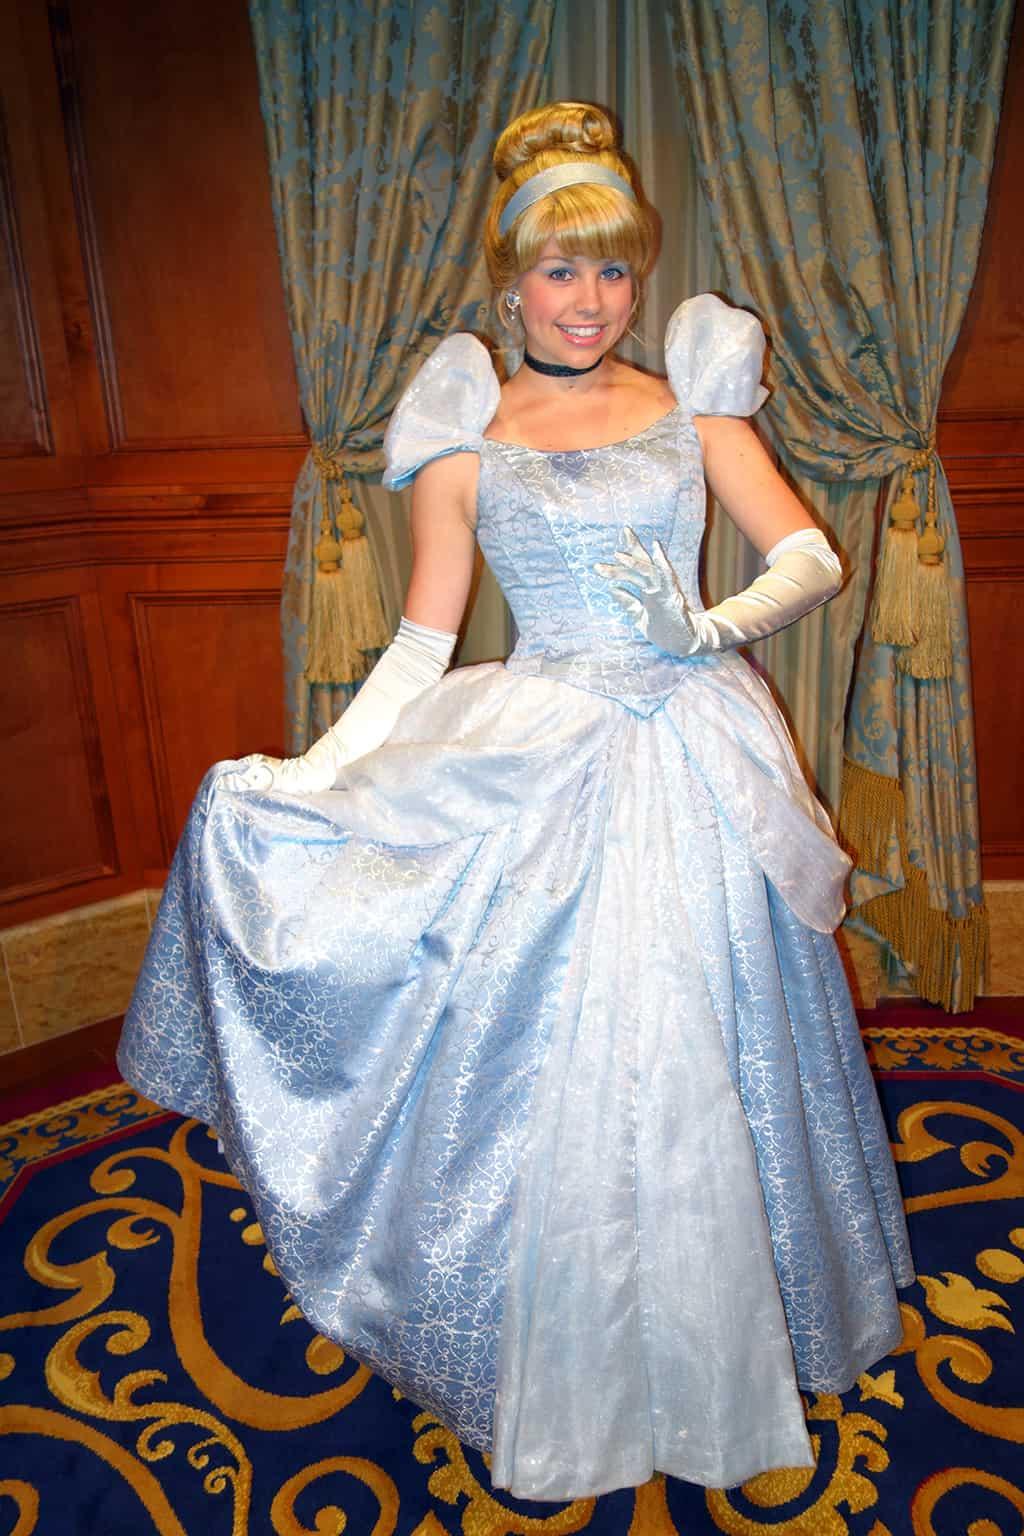 Real life disney princess cinderella sorry, can